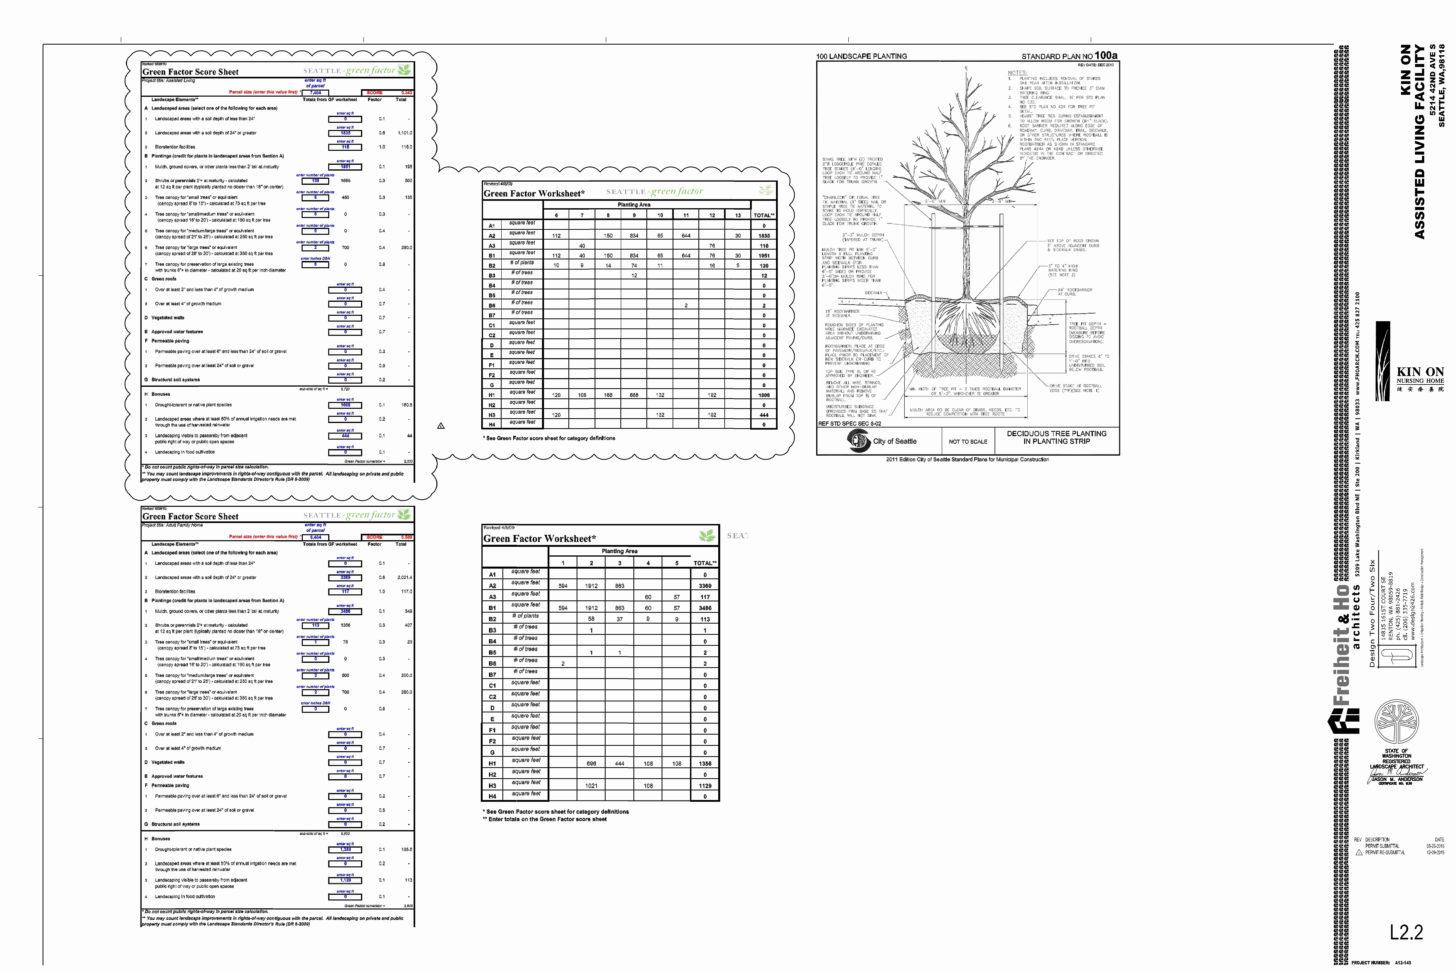 Ashrae Load Calculation Spreadsheet Xls Throughout Ashrae Load Calculation Spreadsheet Xls Luxury  Austinroofing